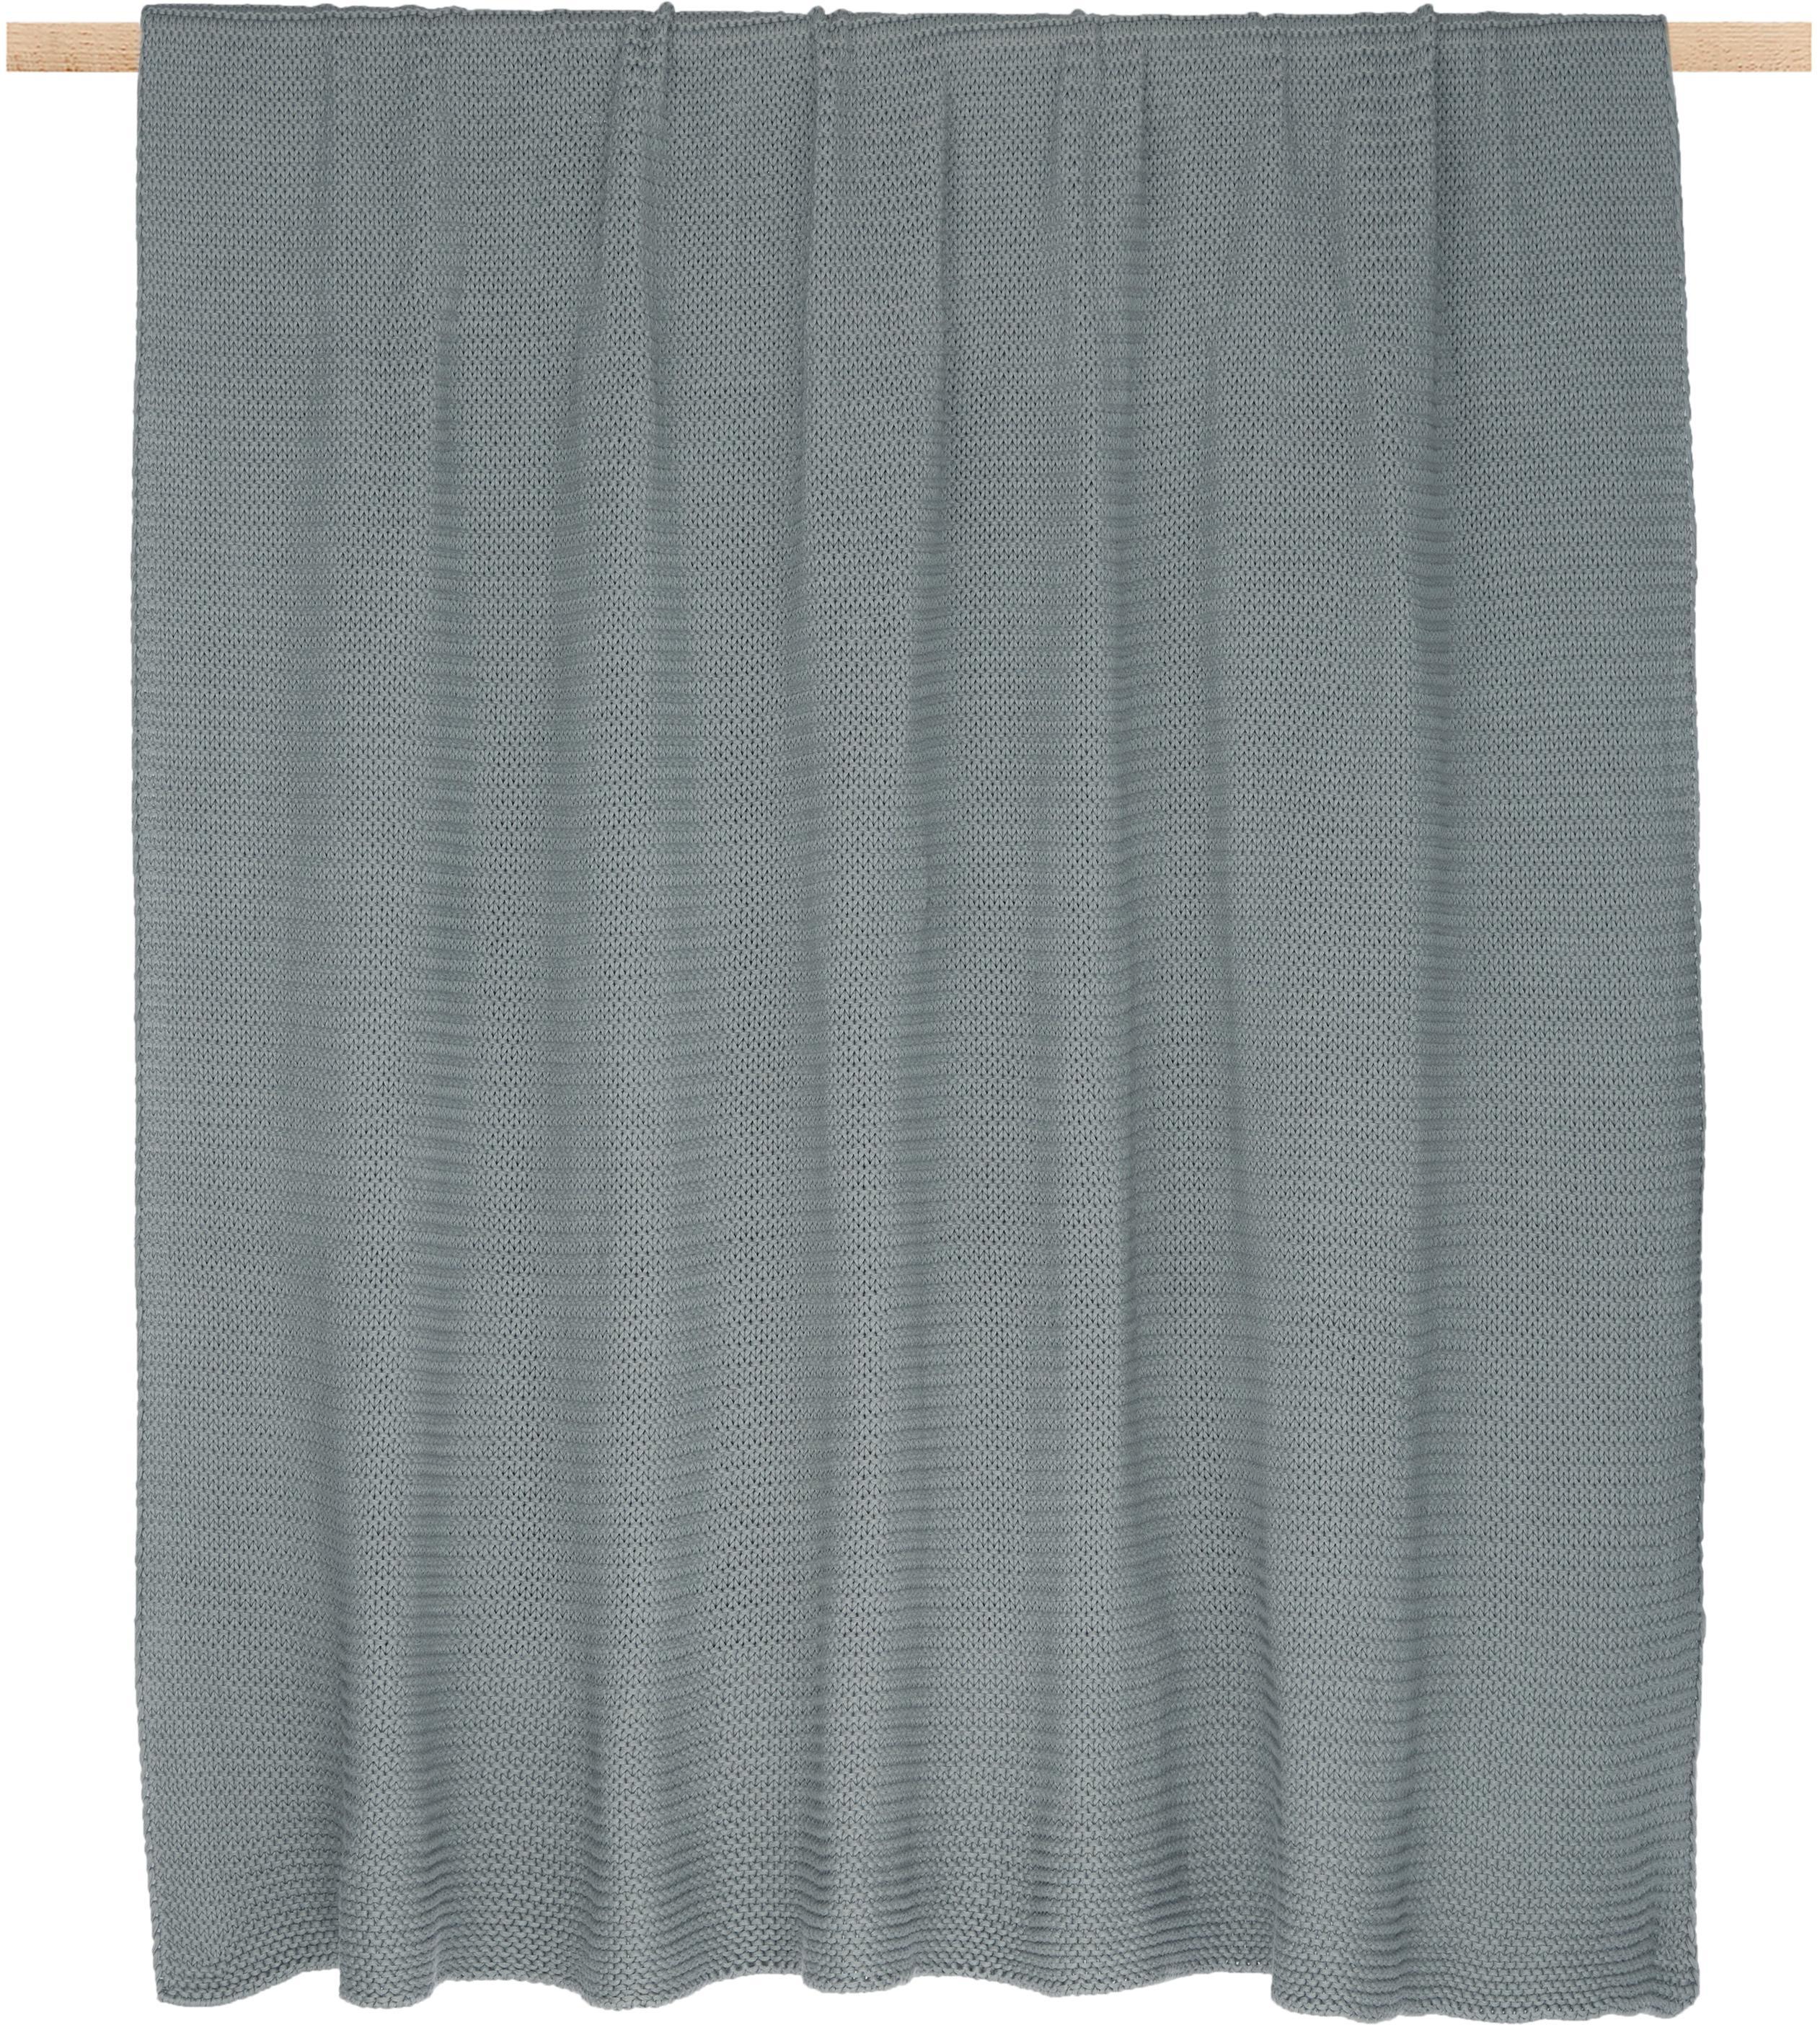 Plaid fatto a maglia Adalyn, 100% cotone, Verde salvia, Larg. 150 x Lung. 200 cm